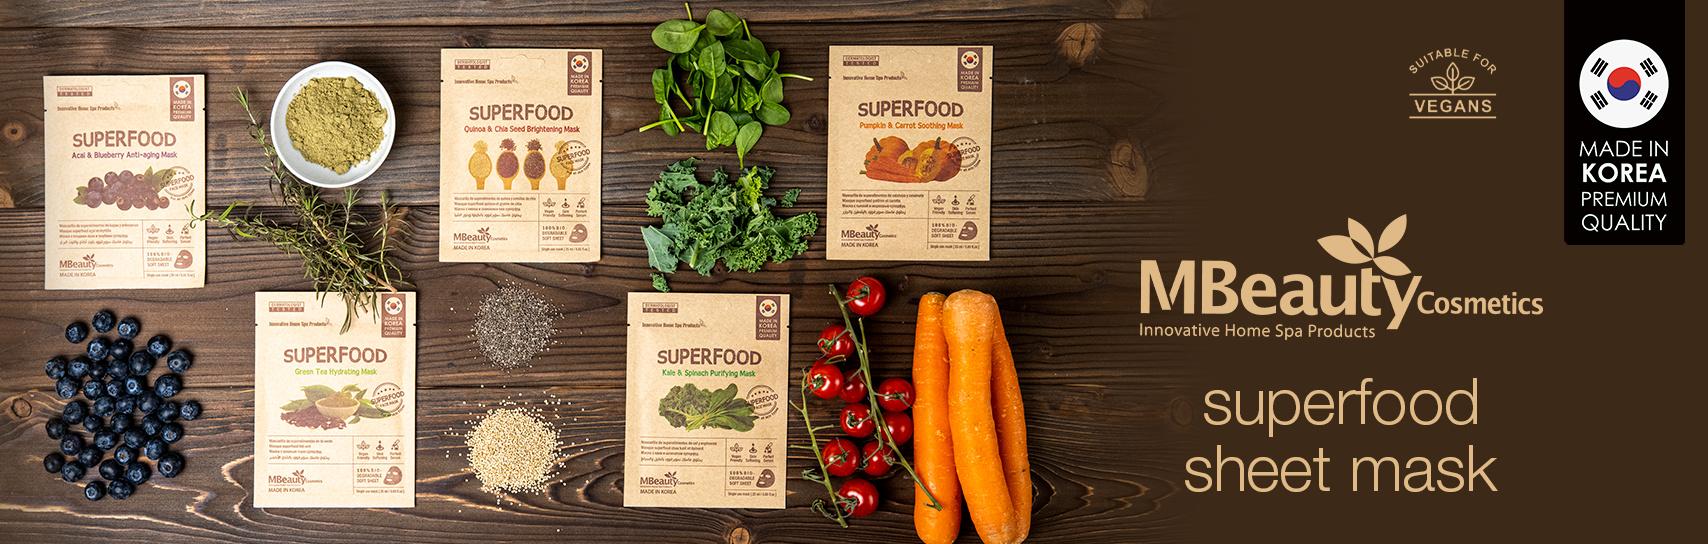 [MBeauty - superfood masks - products]